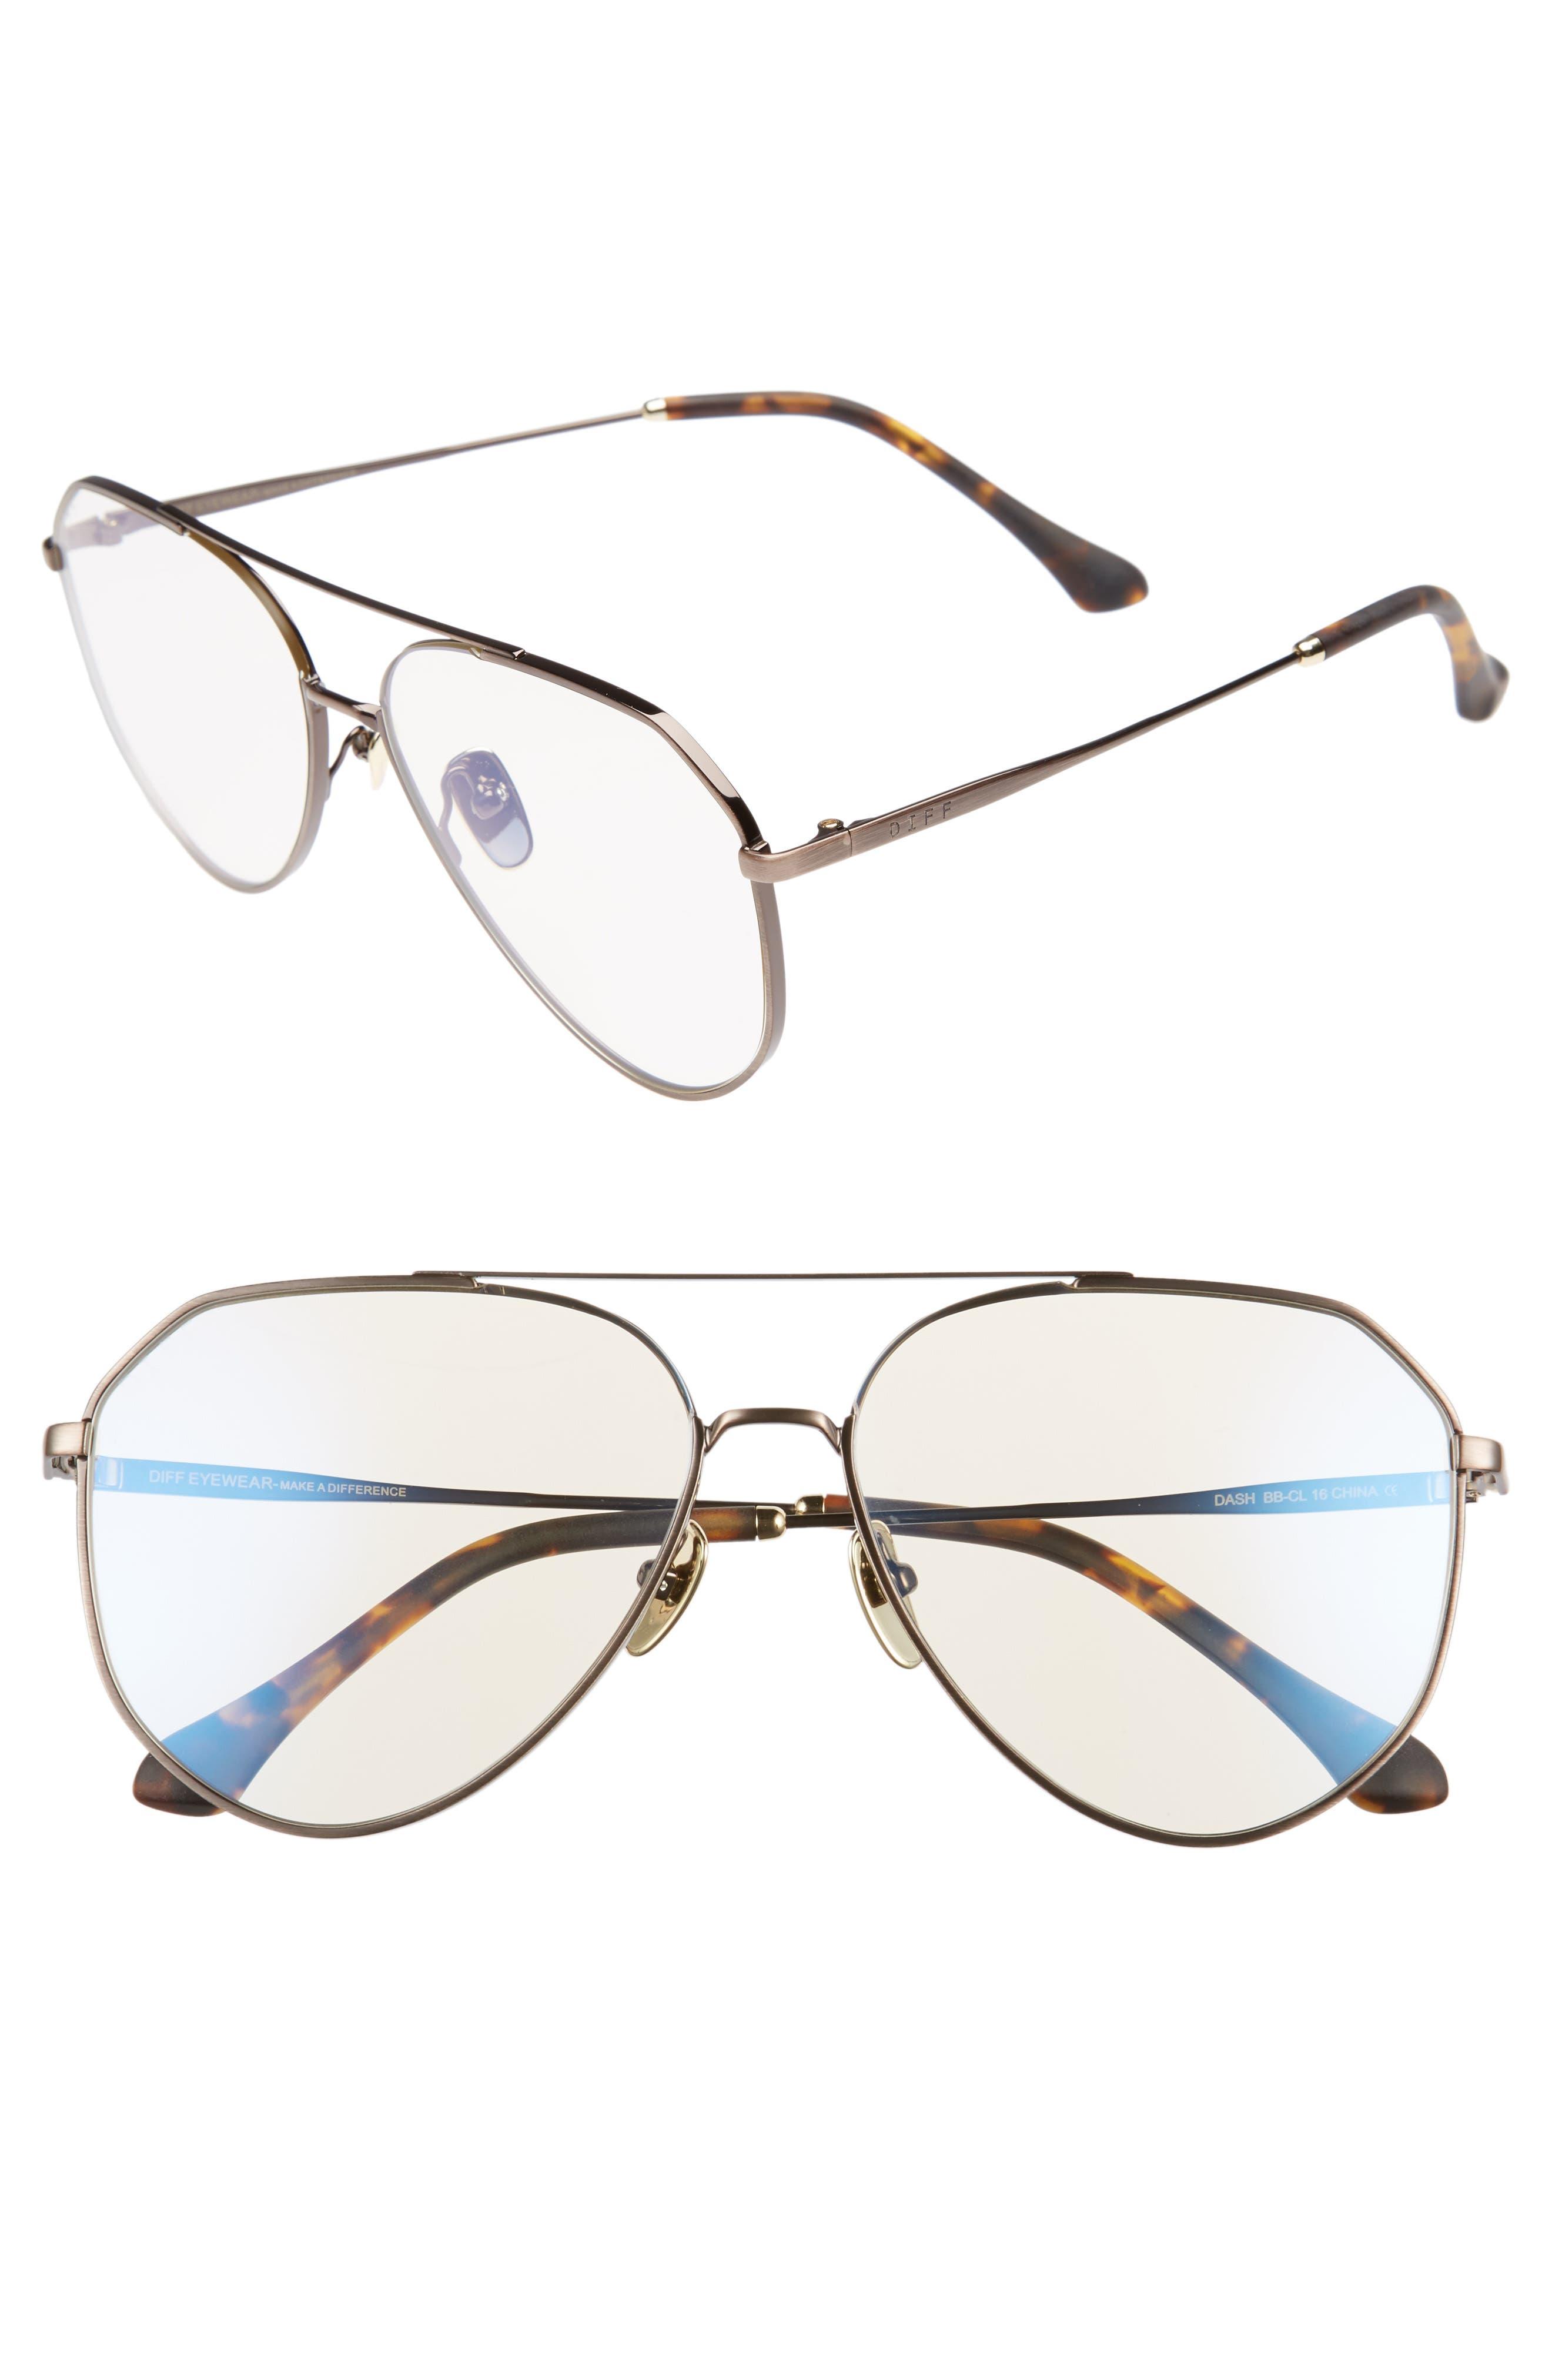 Dash 61mm Aviator Sunglasses,                         Main,                         color, 200